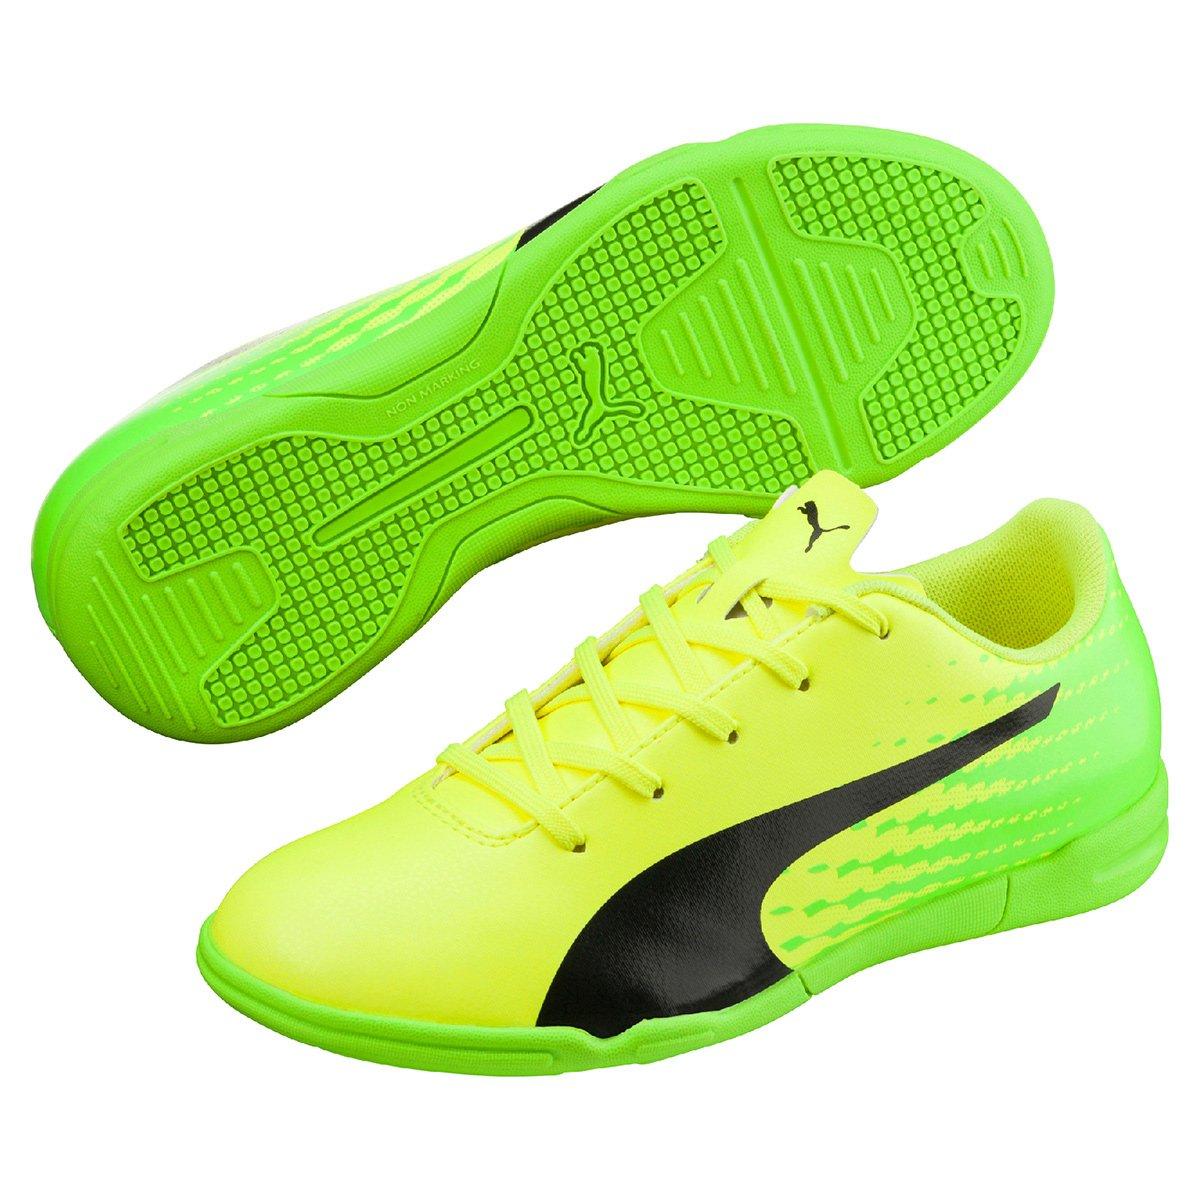 0c75fb1d77a18 Chuteira Futsal Infantil Puma Evospeed 17.5 IT Masculina - Compre Agora